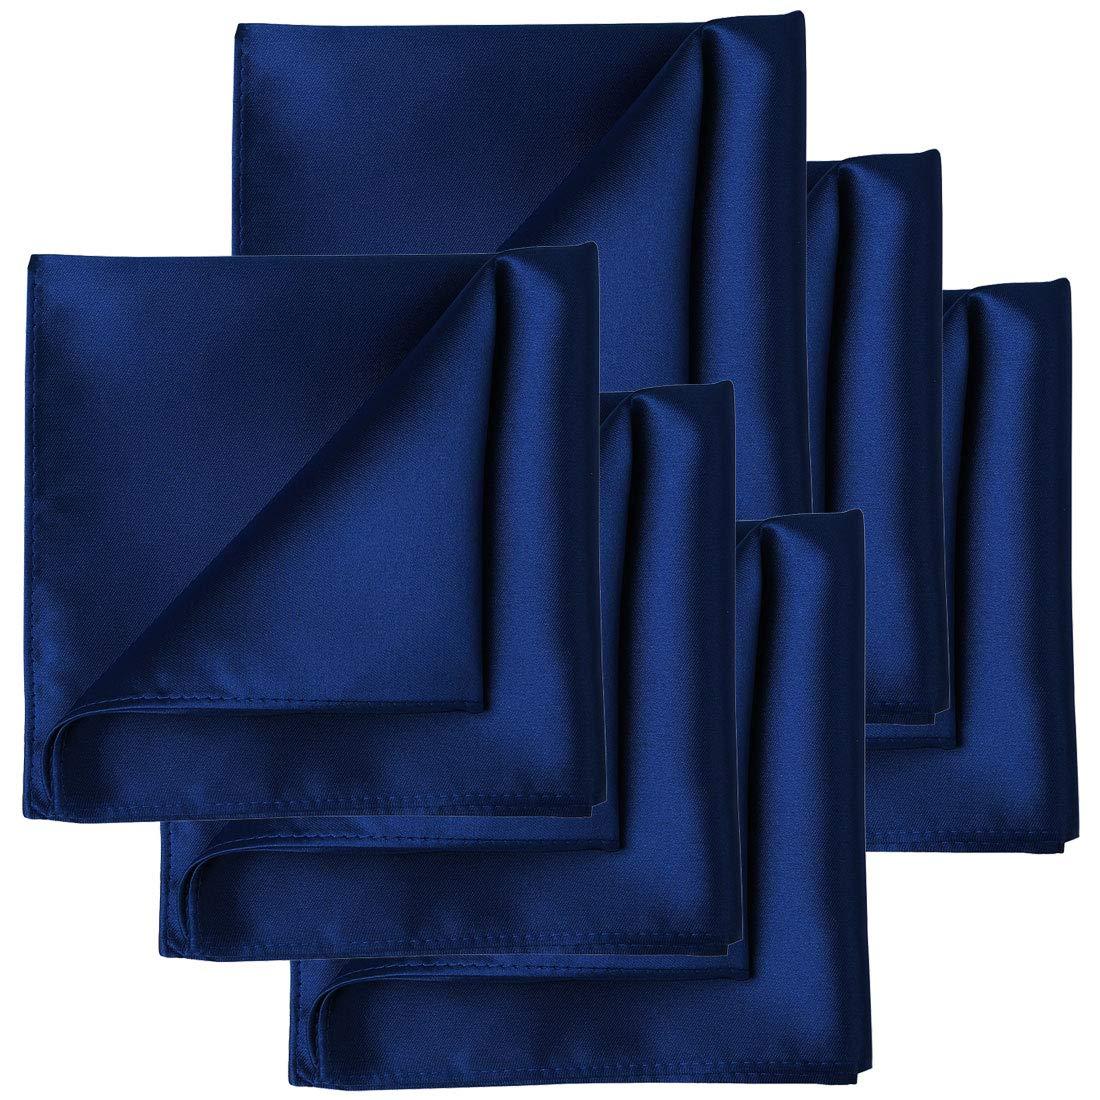 KissTies 6 PCS Navy Blue Satin Pocket Square Solid Color Hankies Gift Set